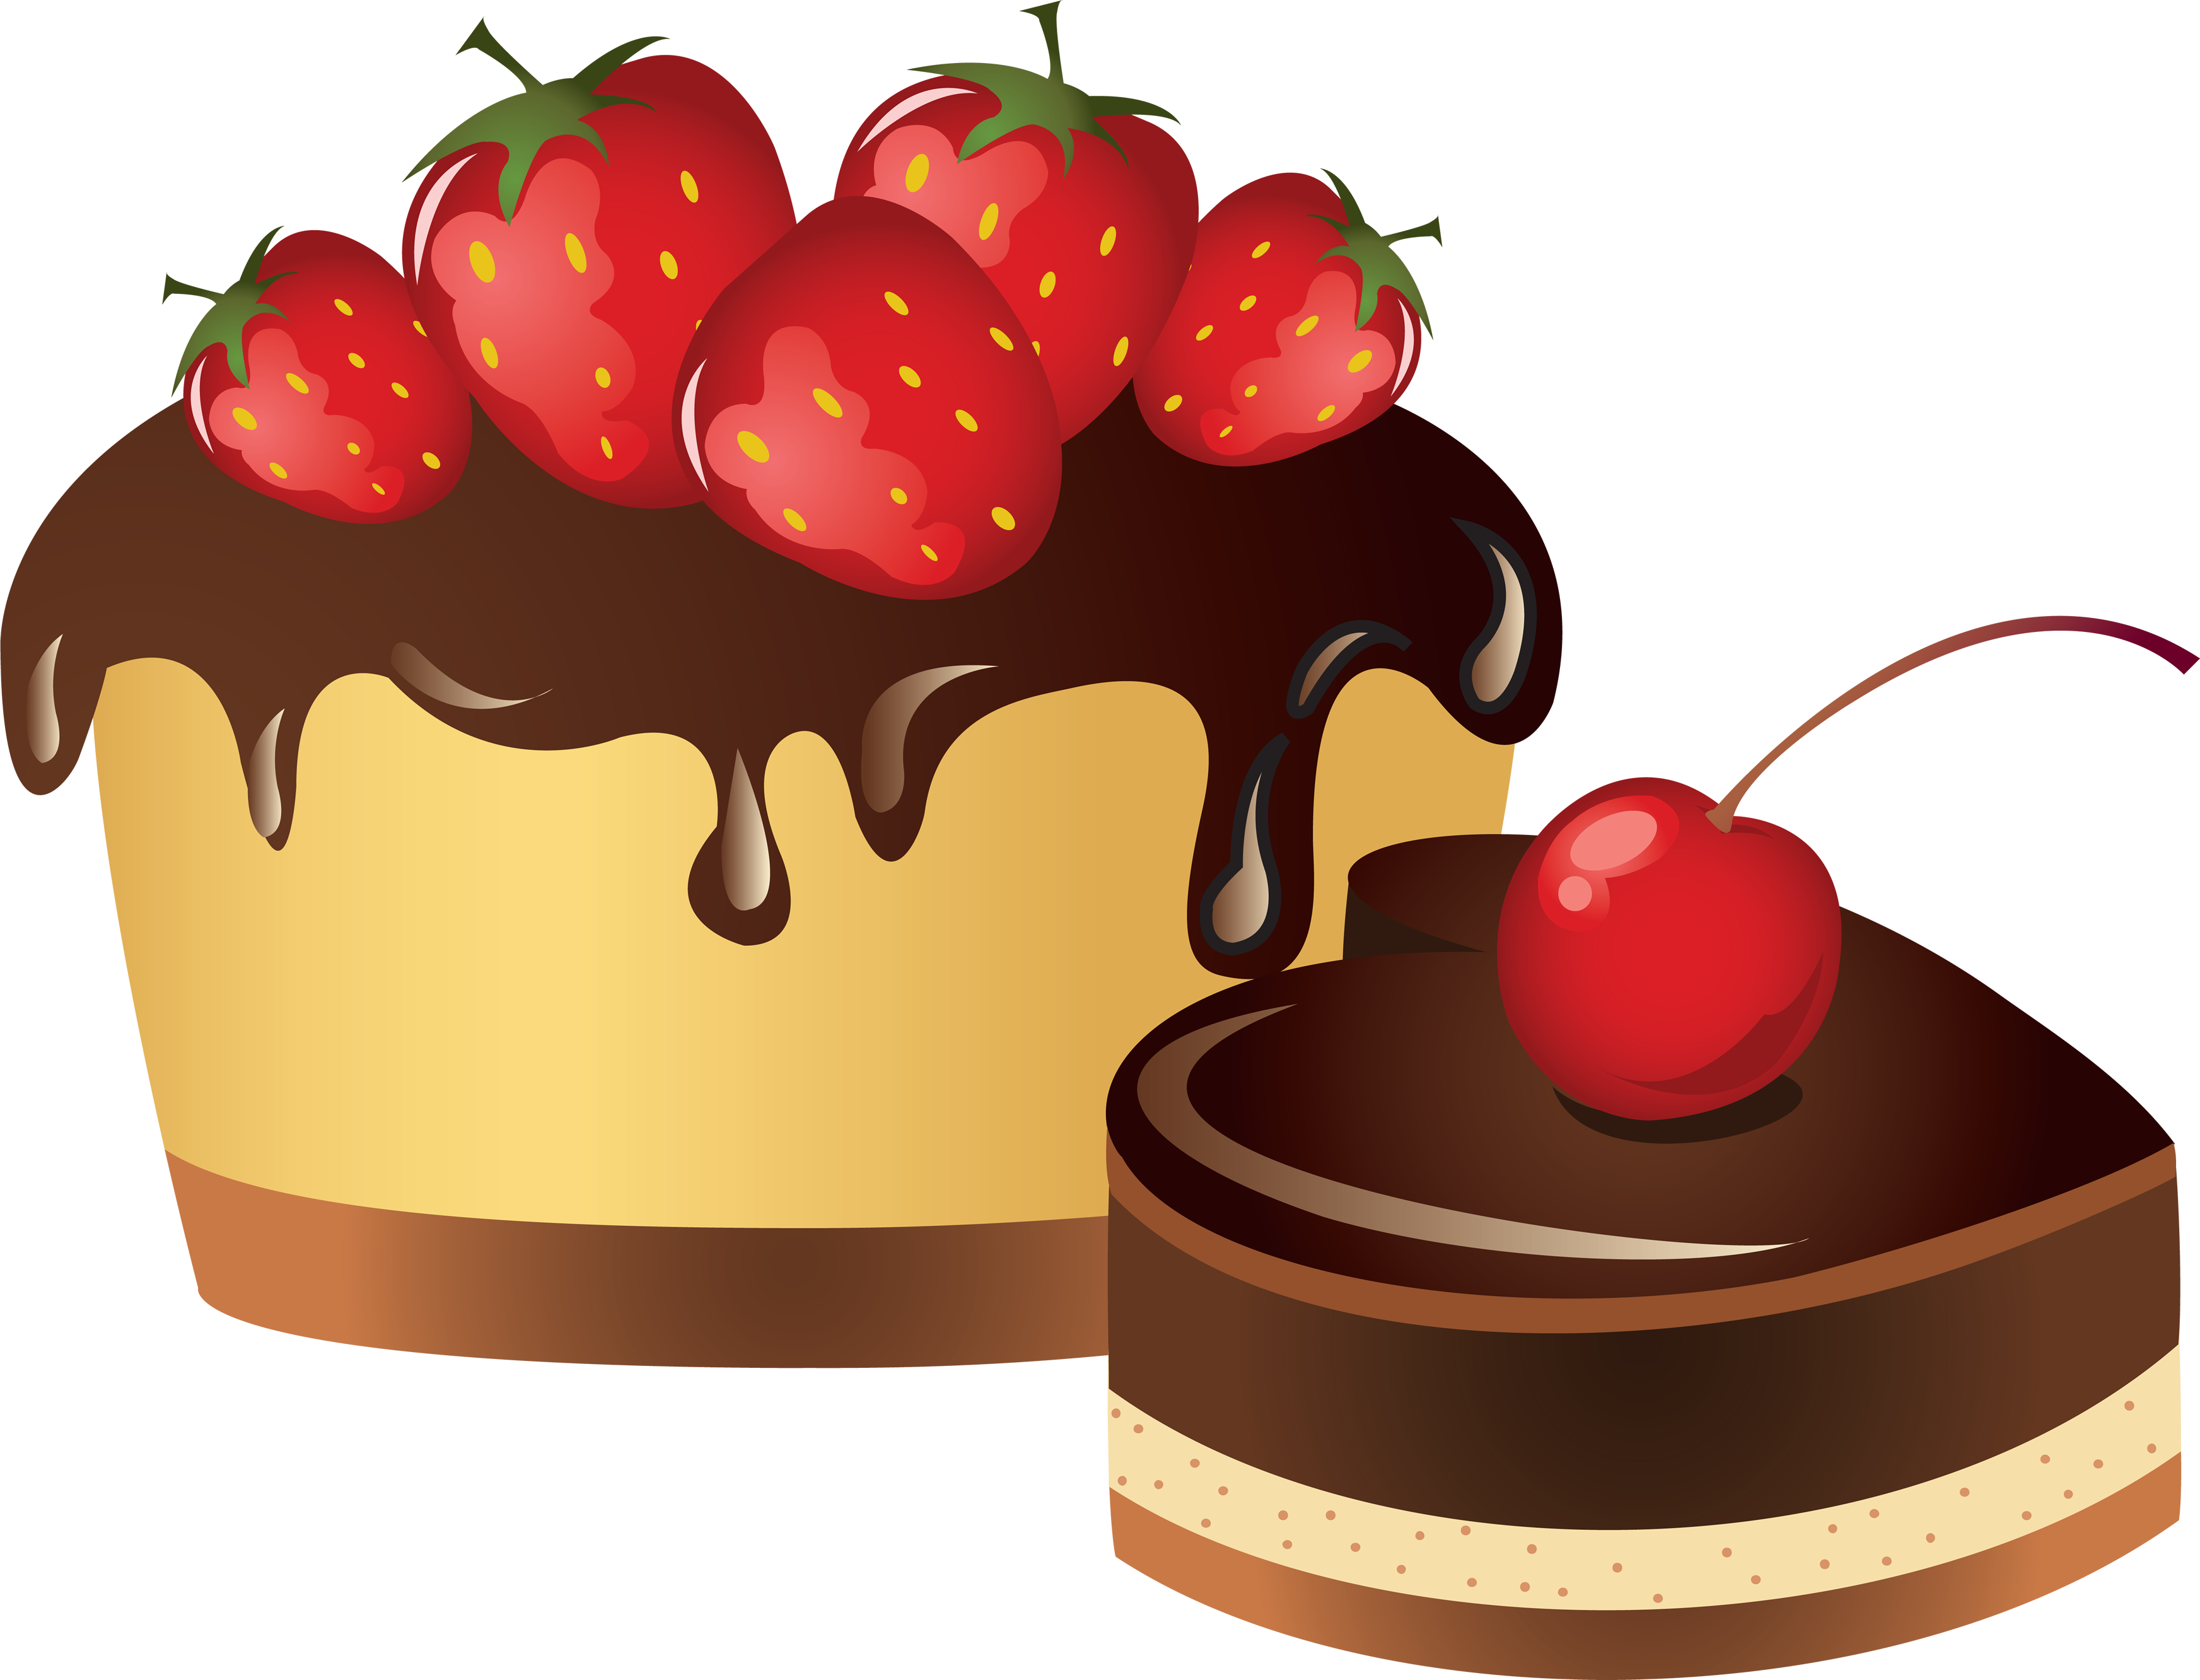 Birthday Cake Graphic Images